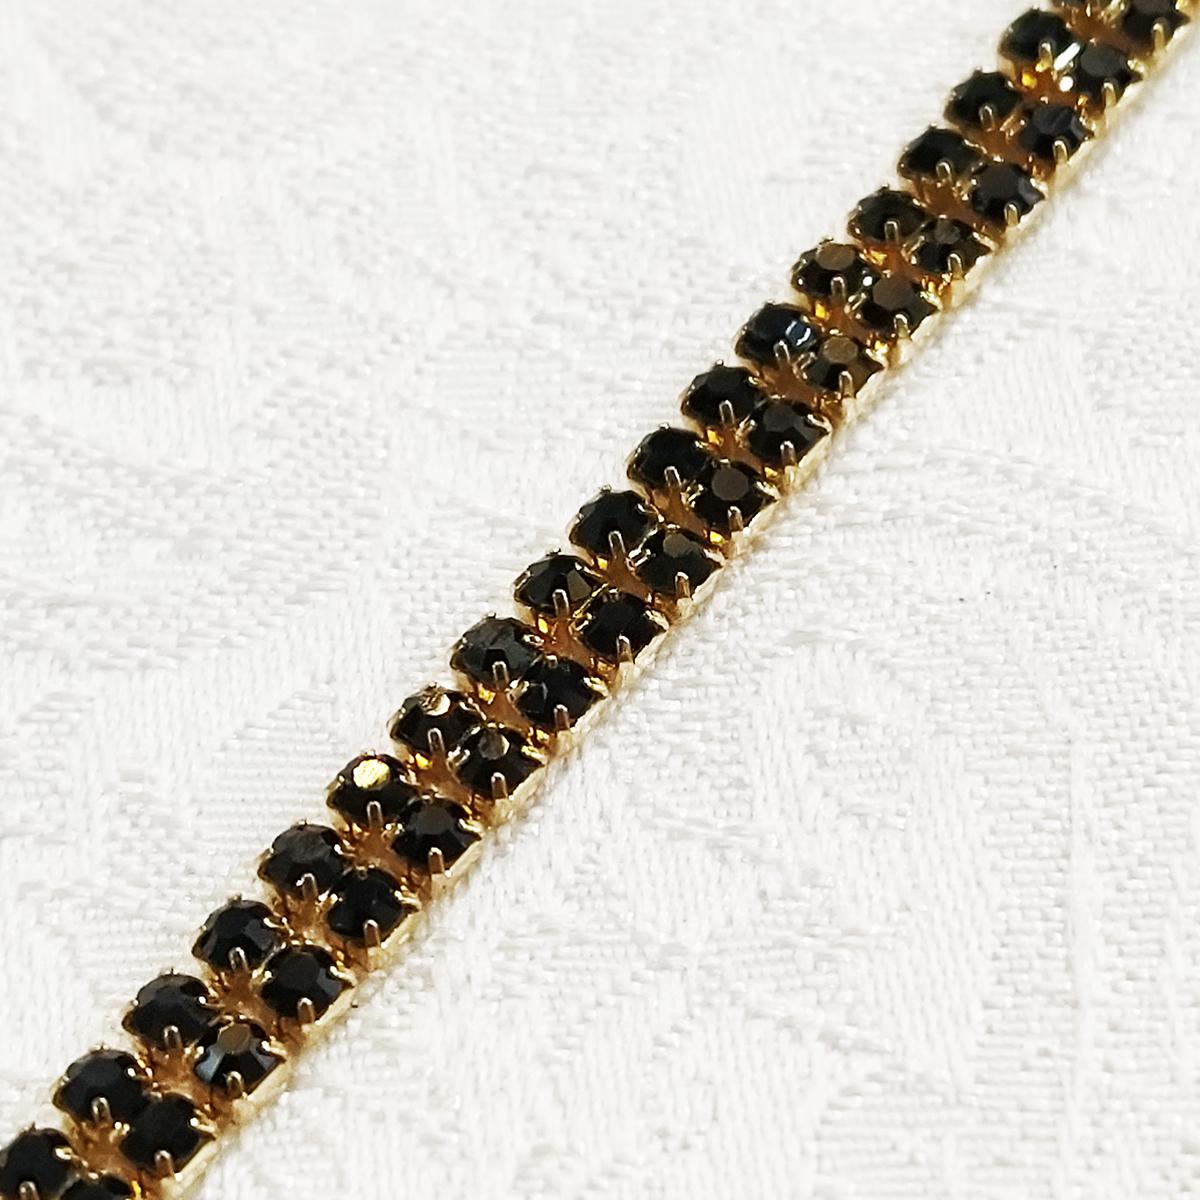 دستبند زنانه سلین کالا مدل اونیکس ce-As2